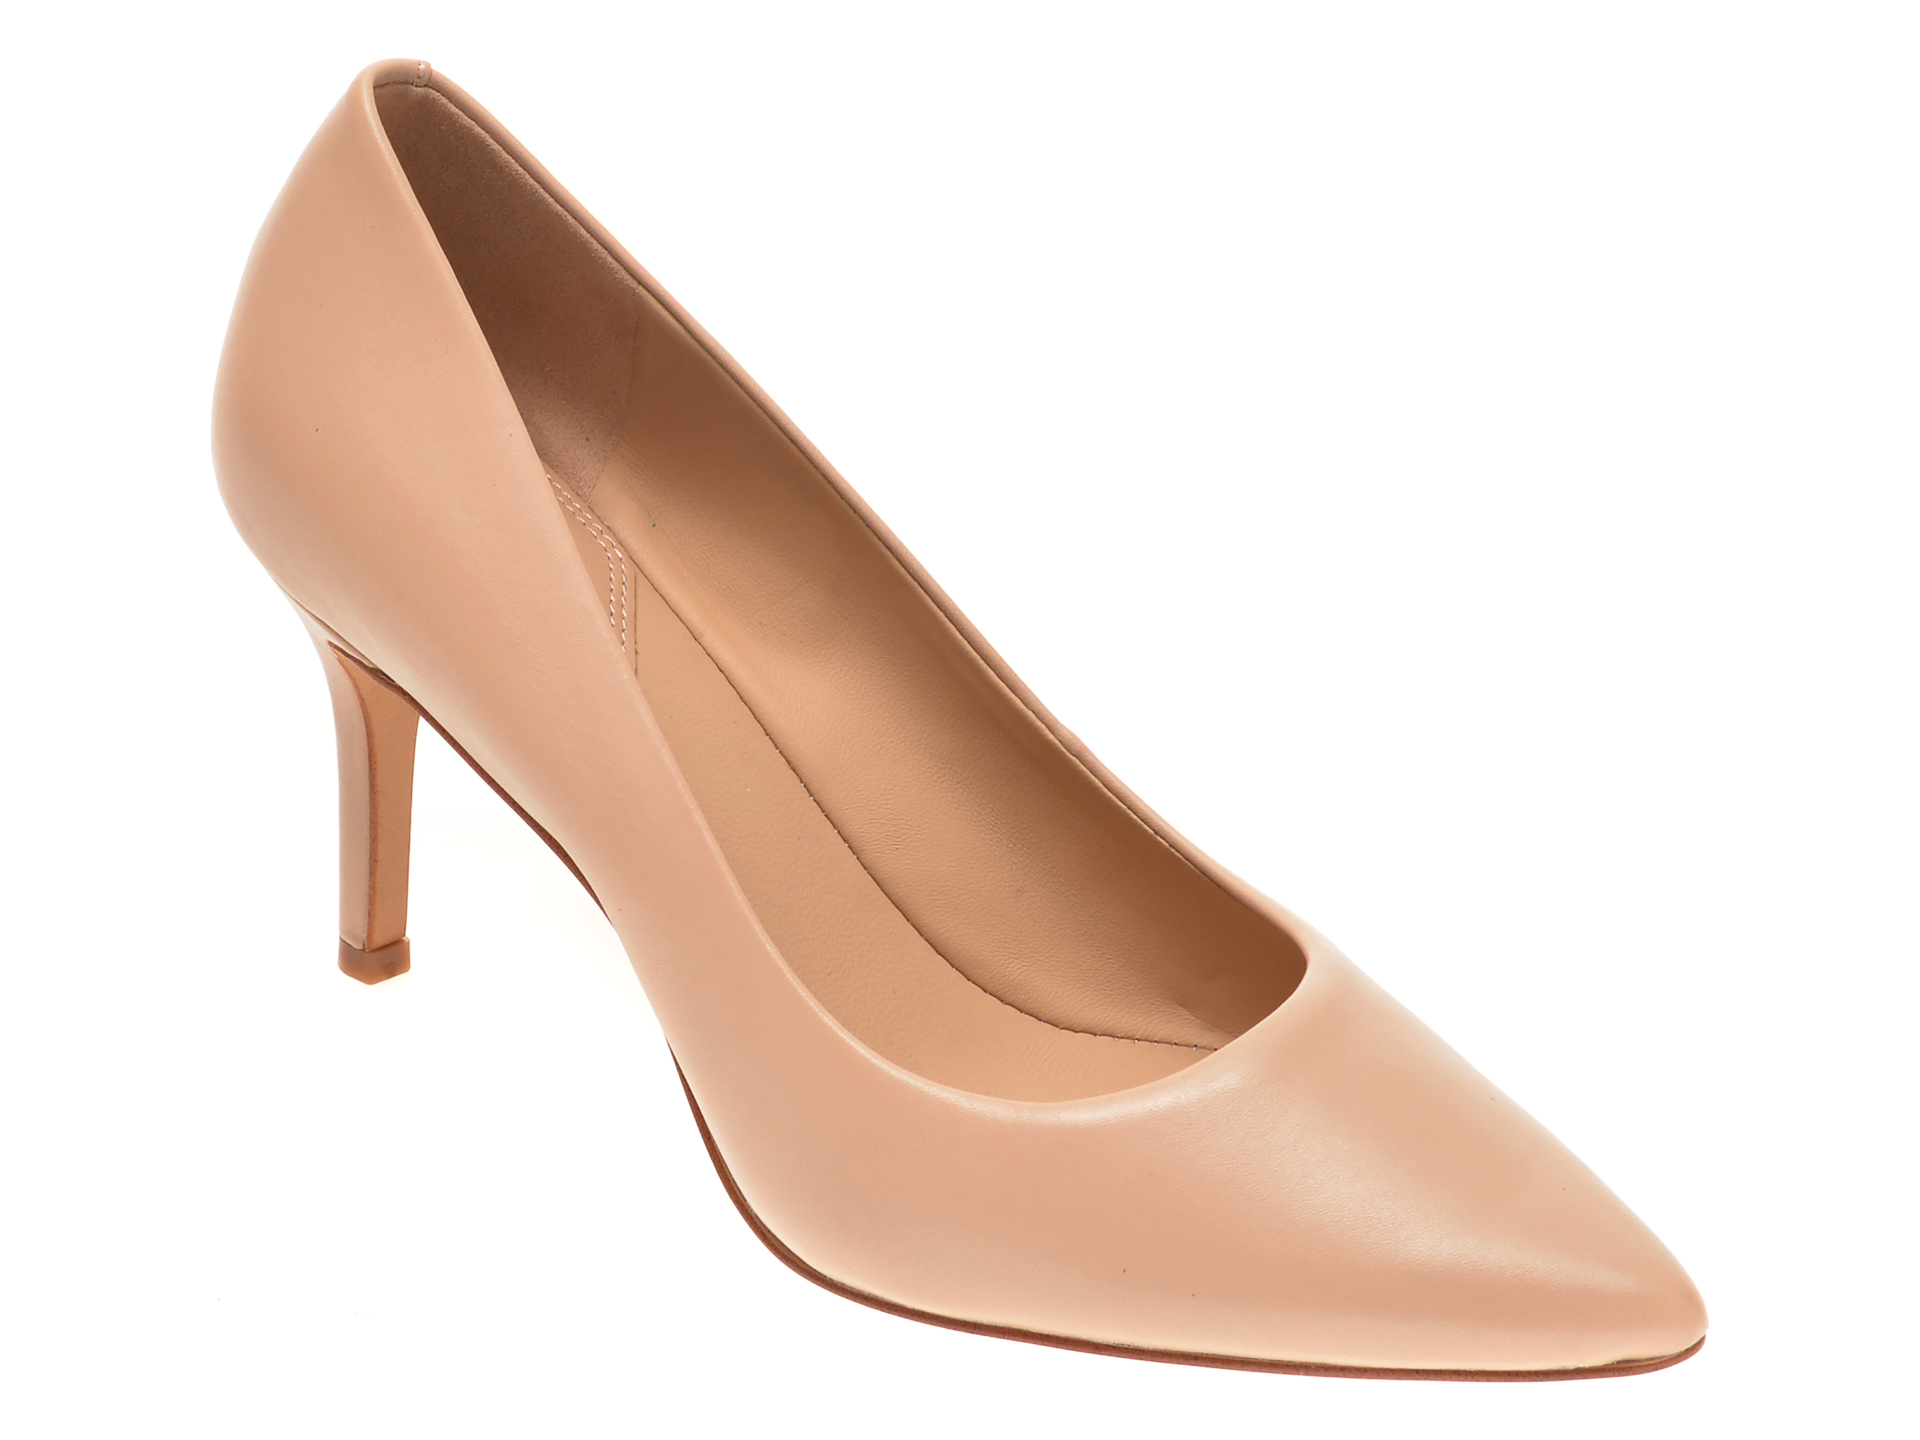 Pantofi ALDO bej, Coronitiflex270, din piele naturala imagine otter.ro 2021